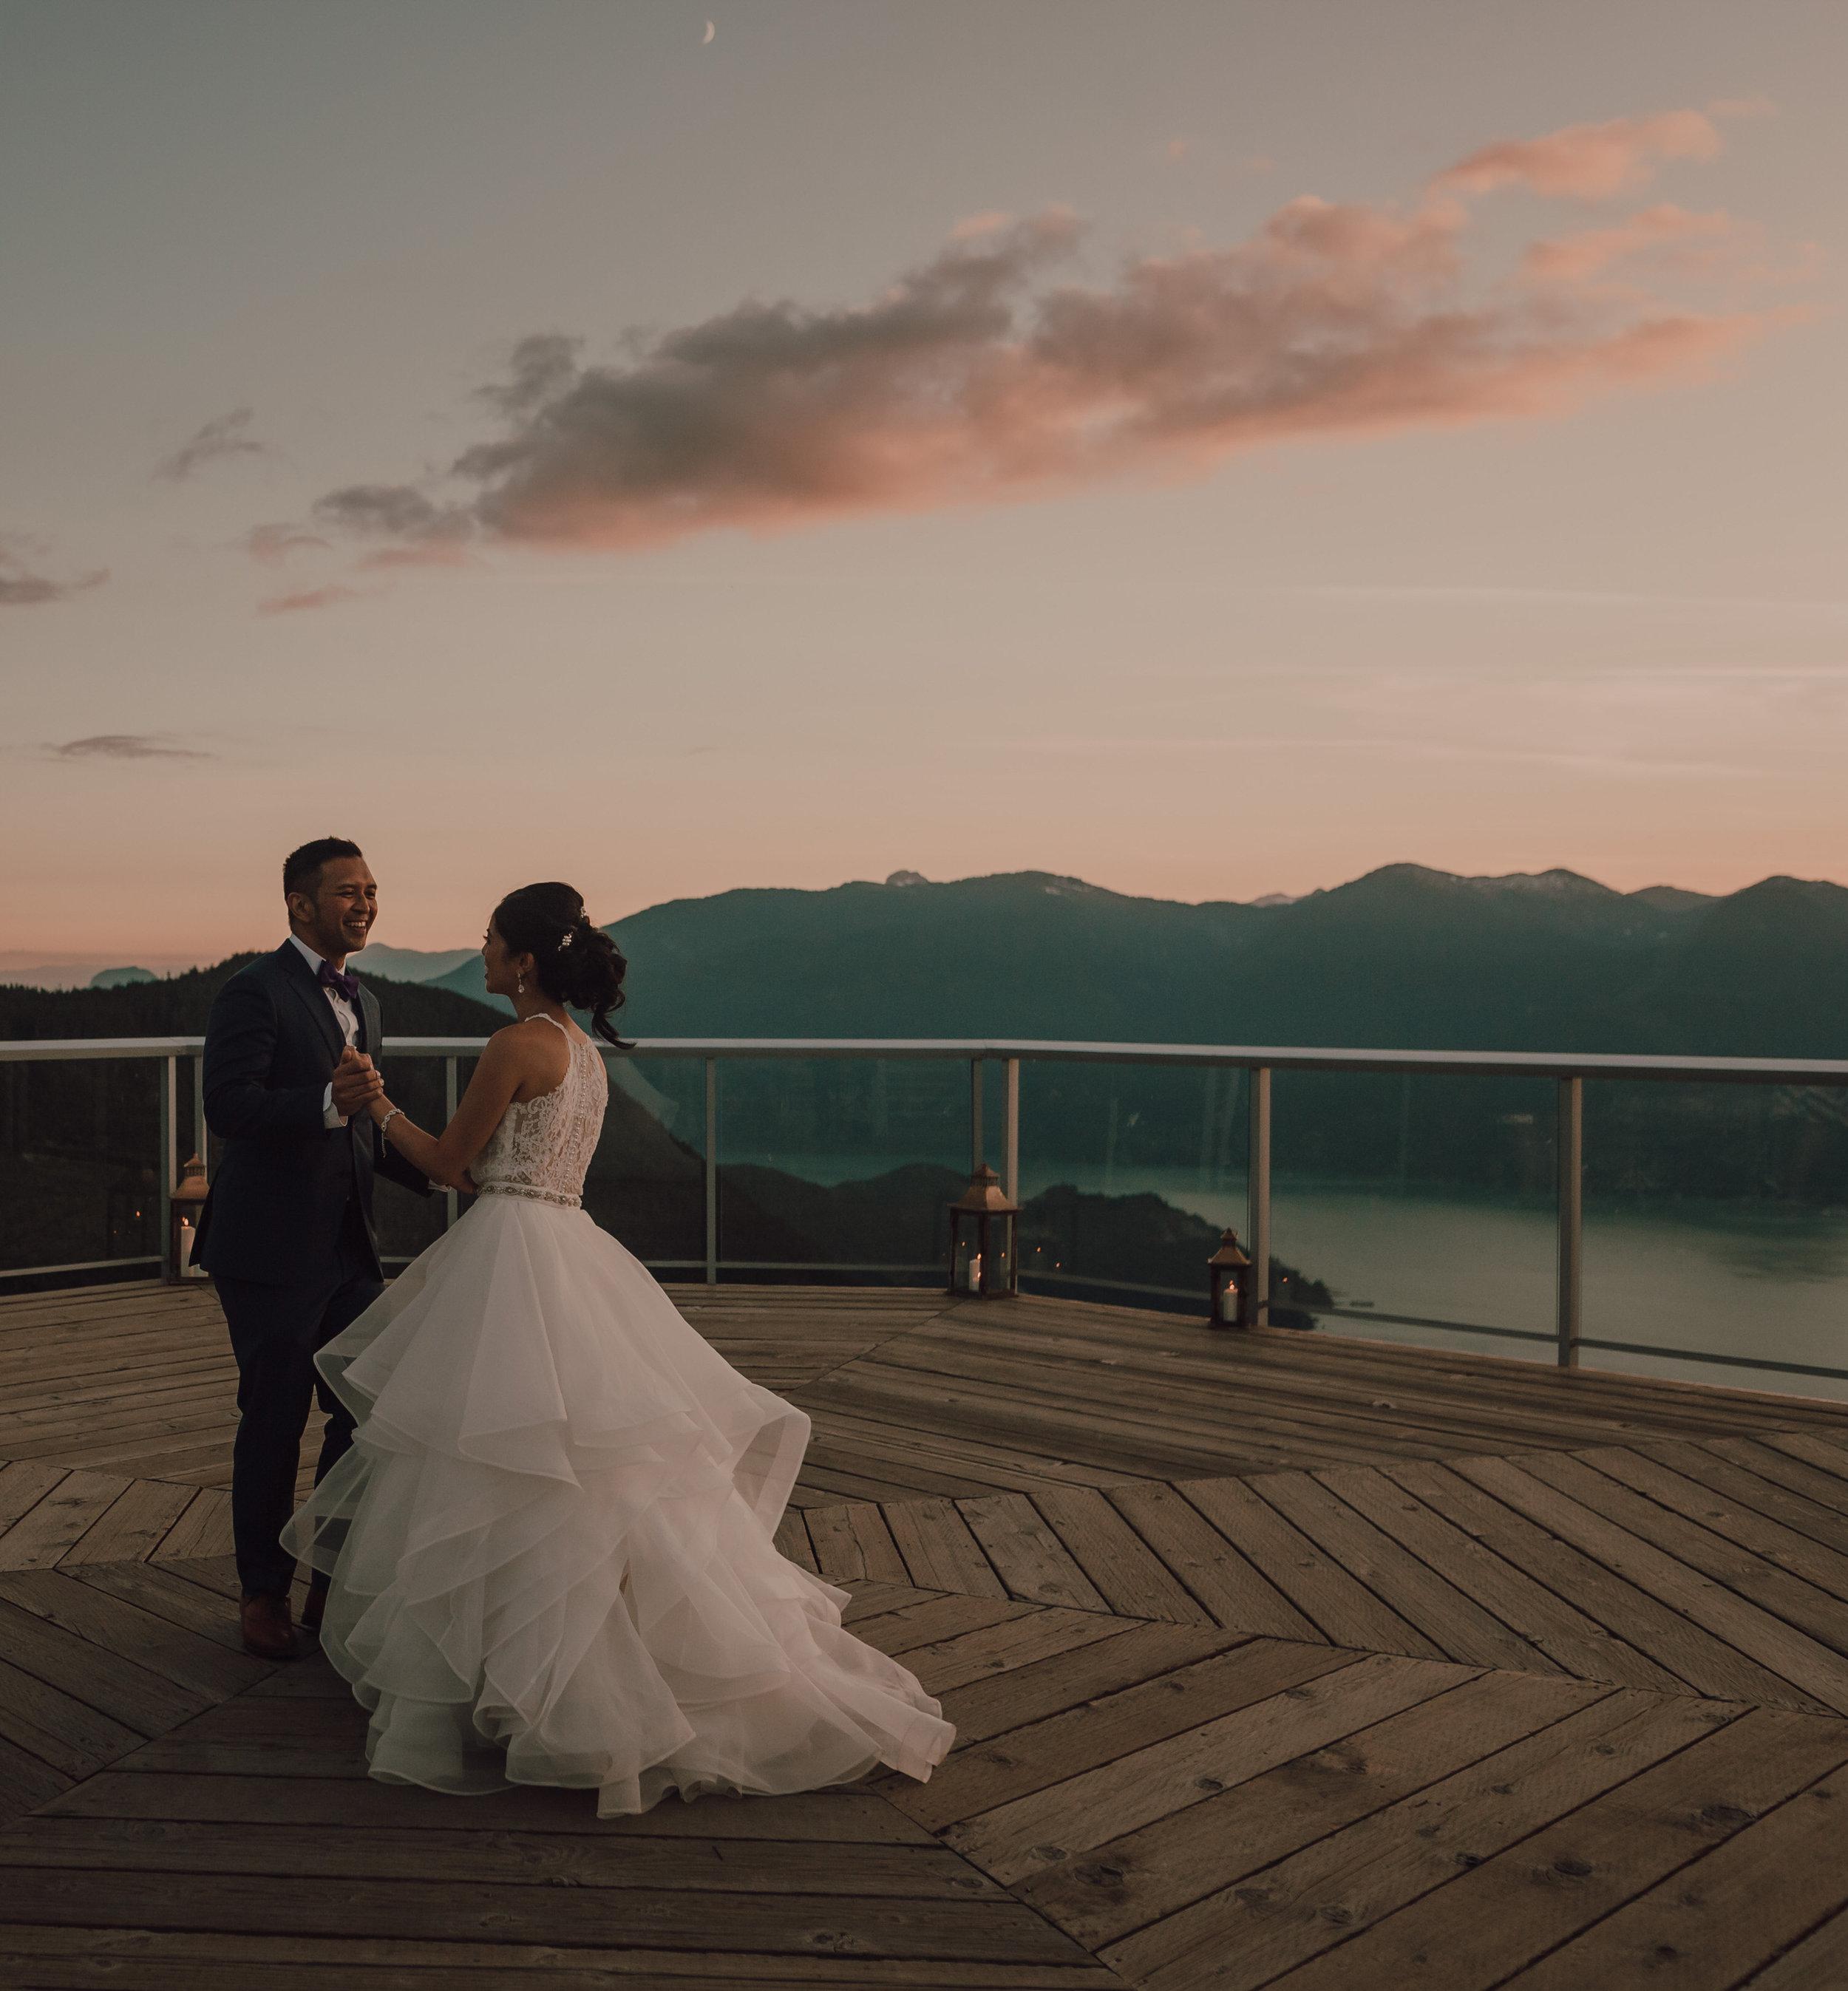 Squamish Wedding Photographer - Sea to Sky Gondola Wedding Photos -  Vancouver Wedding Photographer & Videographer - Sunshine Coast Wedding Photos - Sunshine Coast Wedding Photographer - Jennifer Picard Photography - IMG_5543.jpg